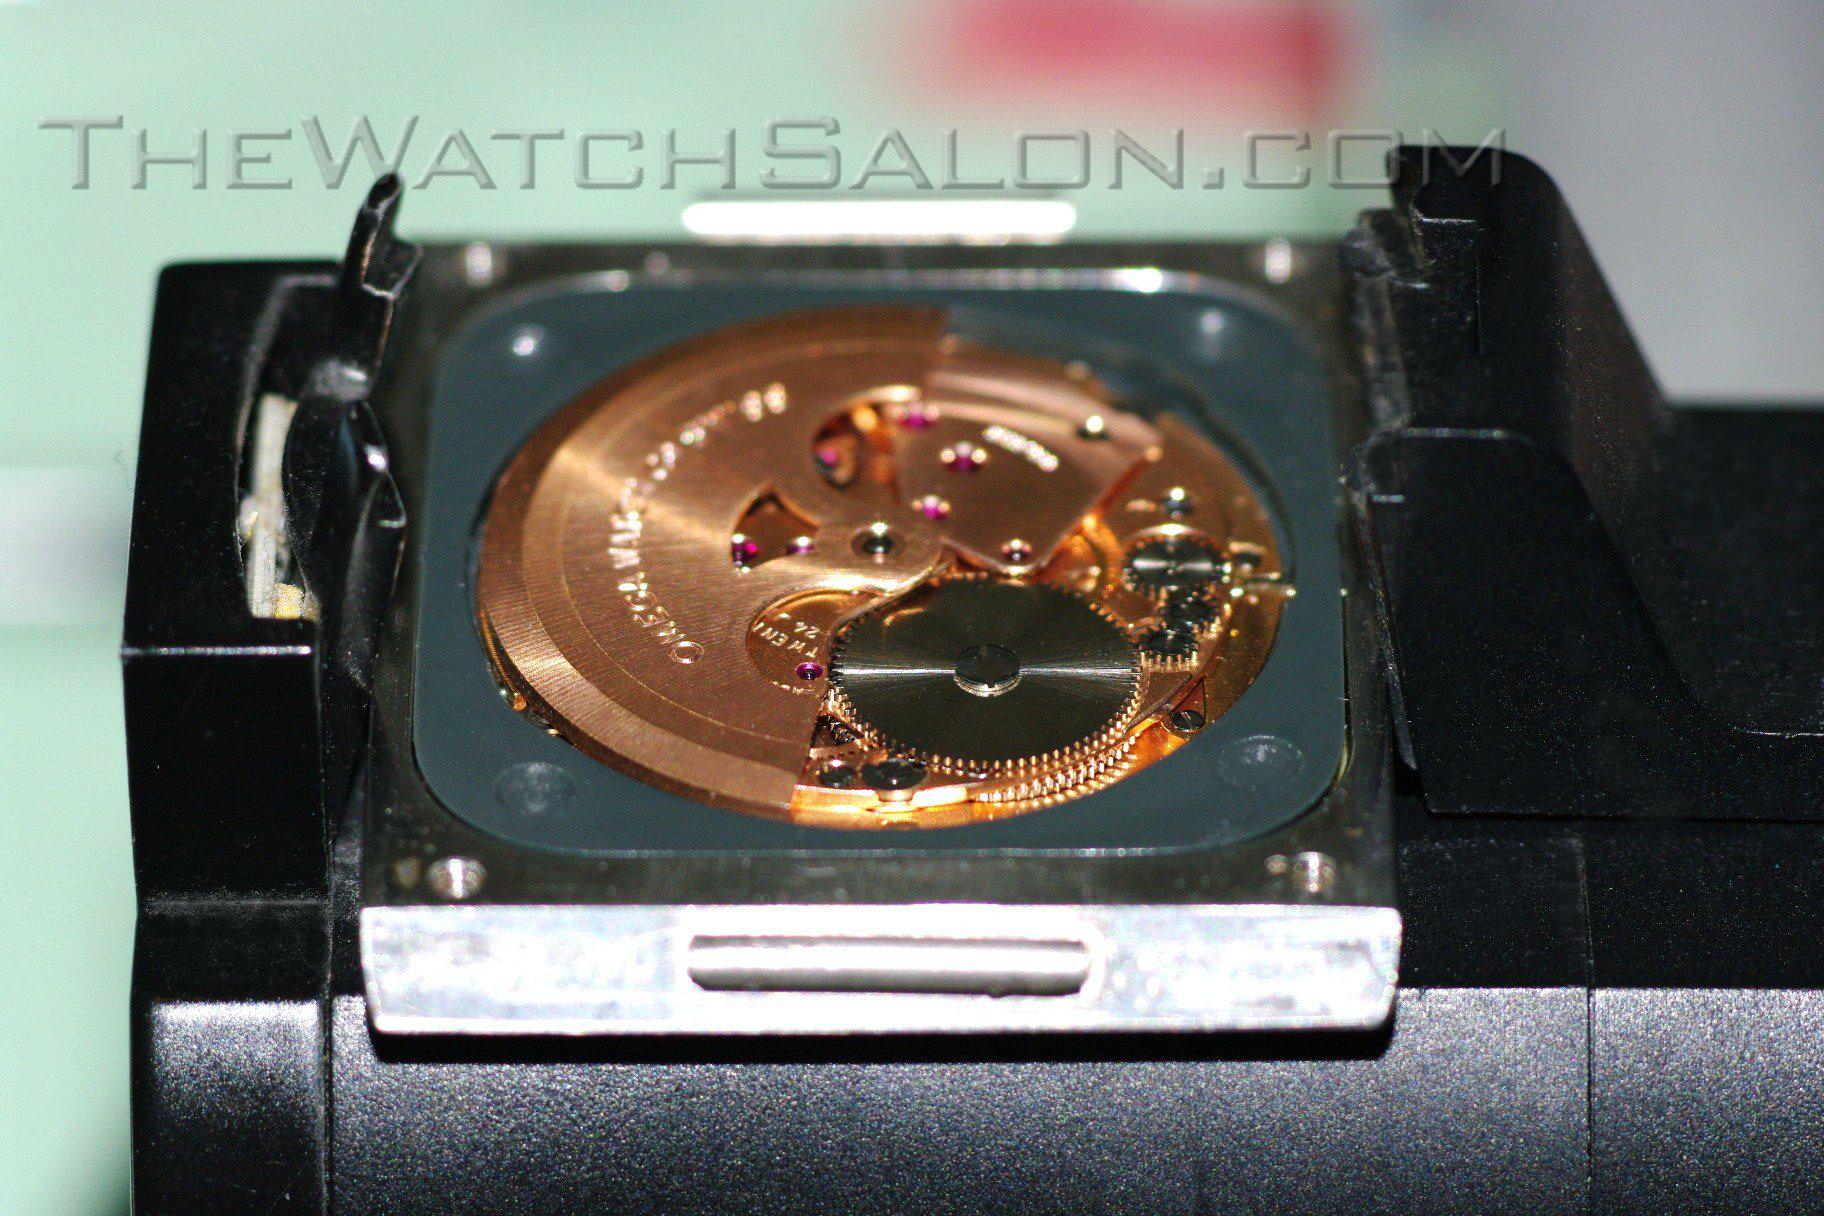 Omega 14k gold Constellation 2000 - 1975 o1 movement